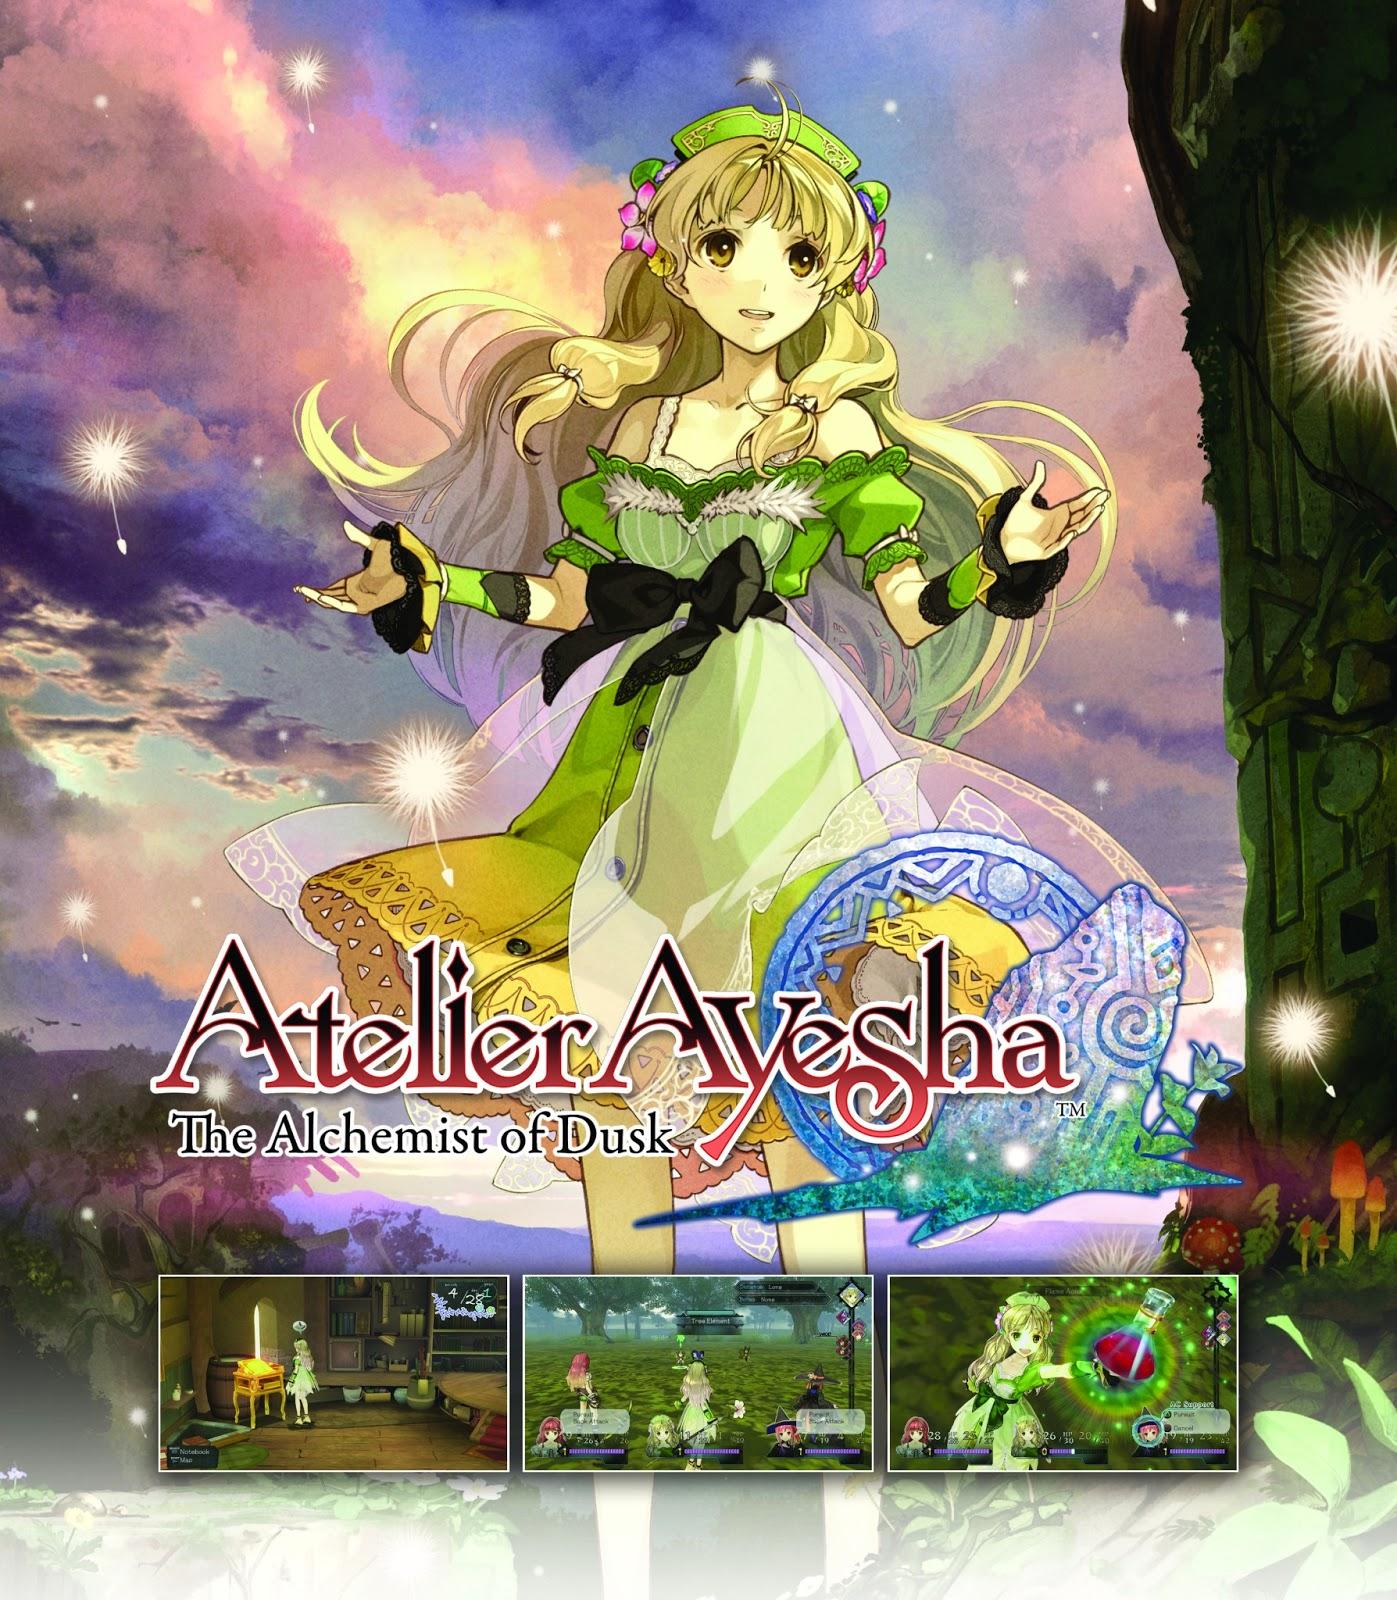 atelier ayesha the alchemist of dusk free download